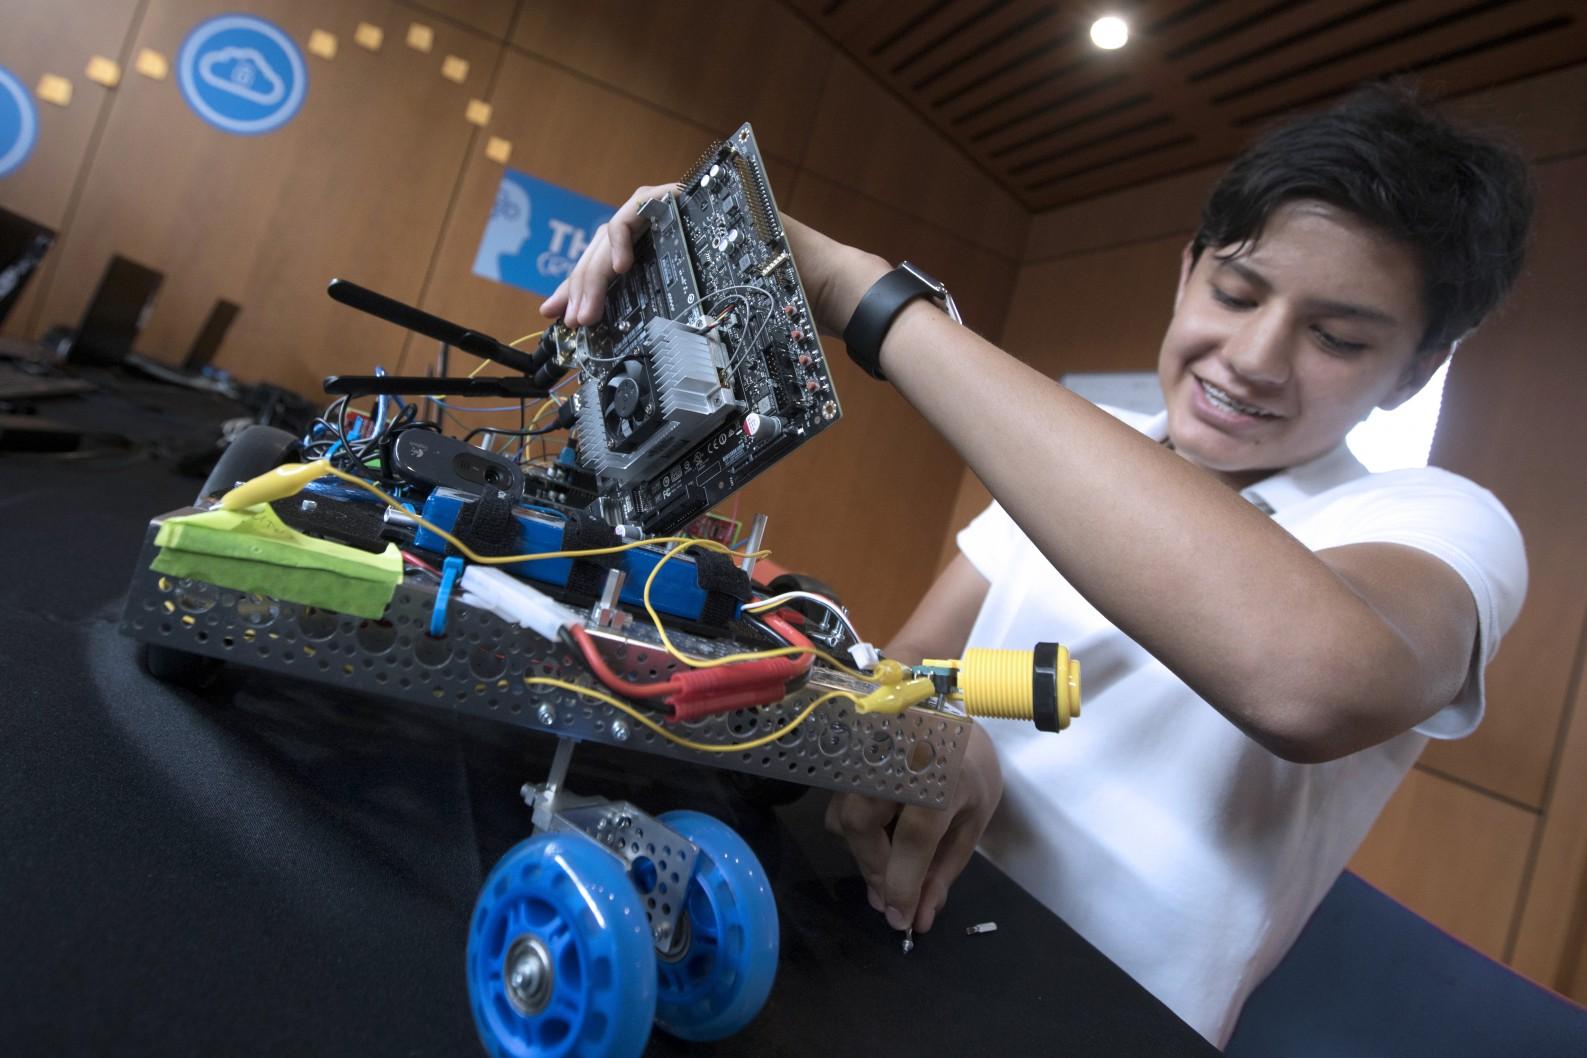 Summer Program - Coding | iD Coding & AI Academy | Held at Rice University